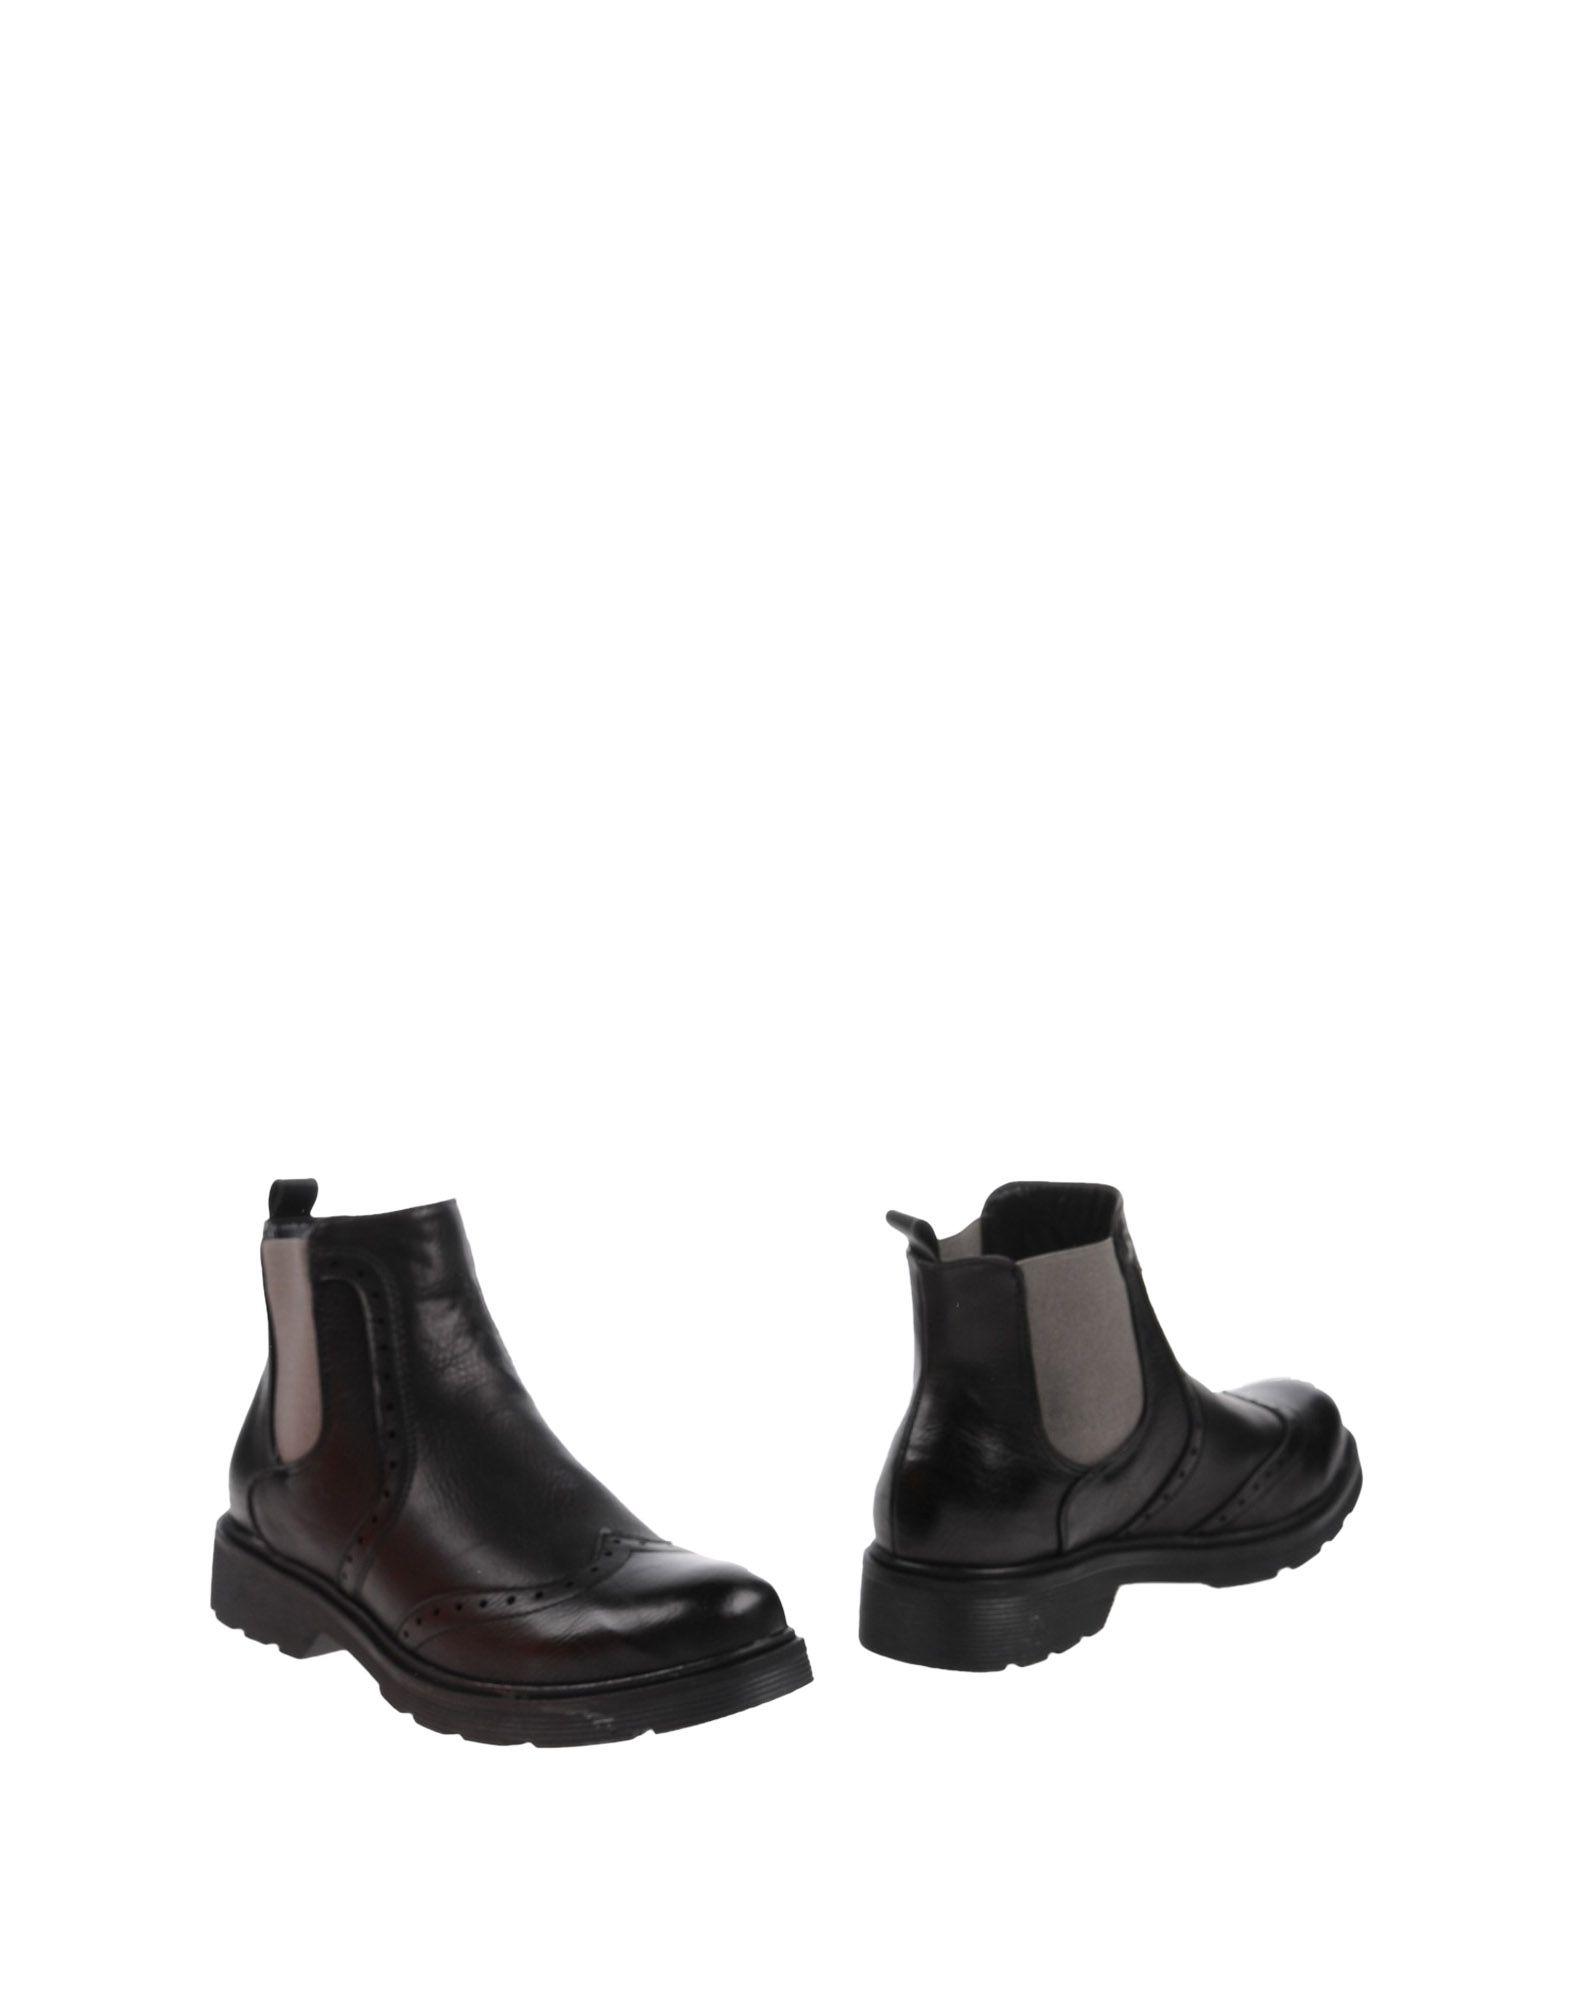 GIOIOSITA Полусапоги и высокие ботинки george j love полусапоги и высокие ботинки